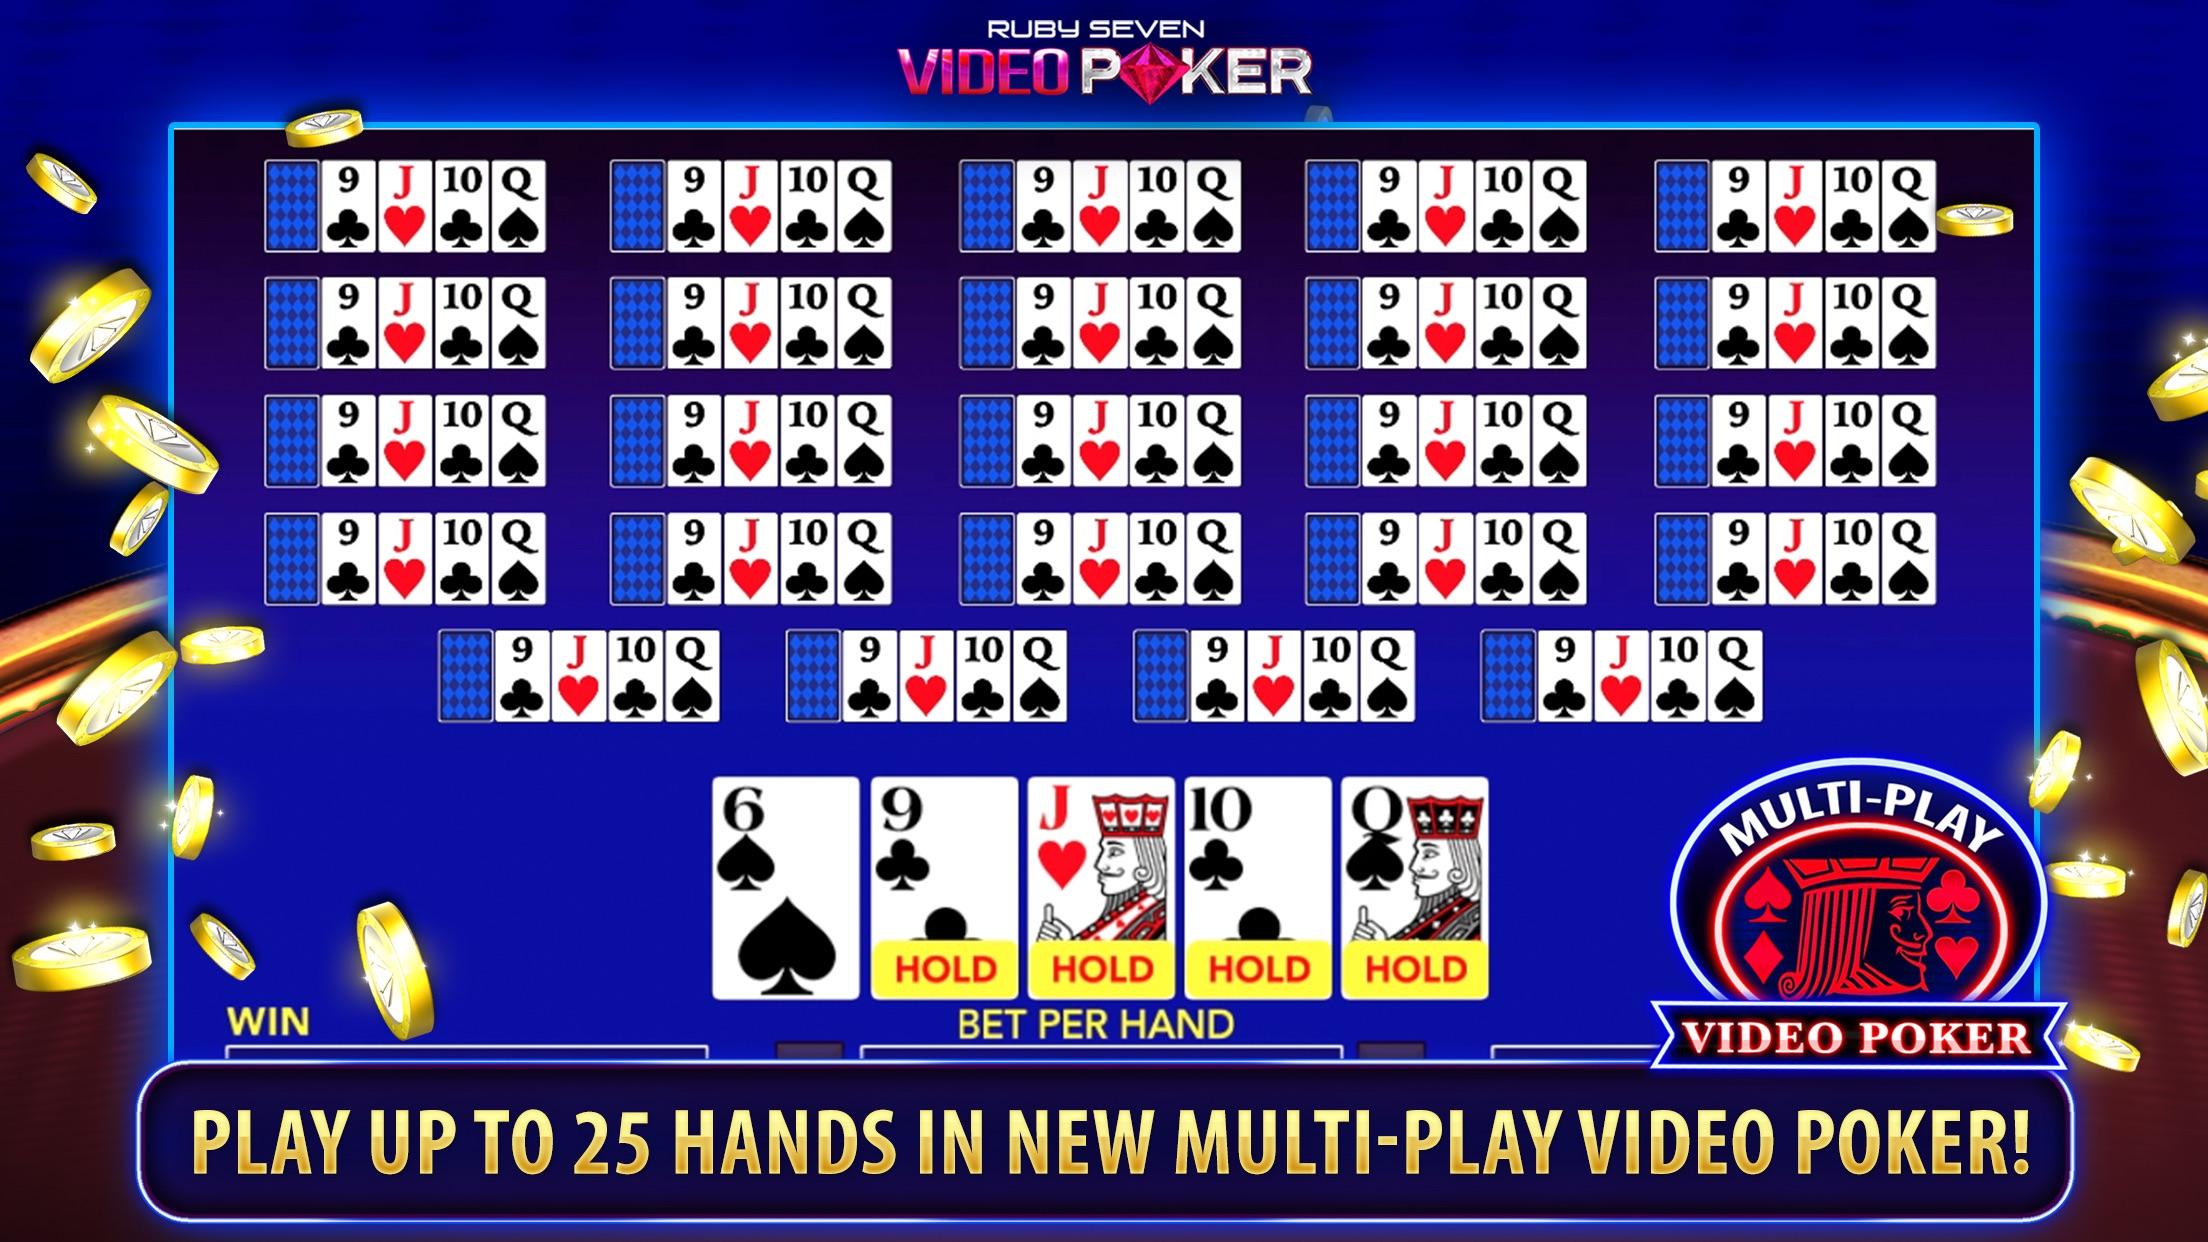 Ruby Seven Video Poker Screenshot